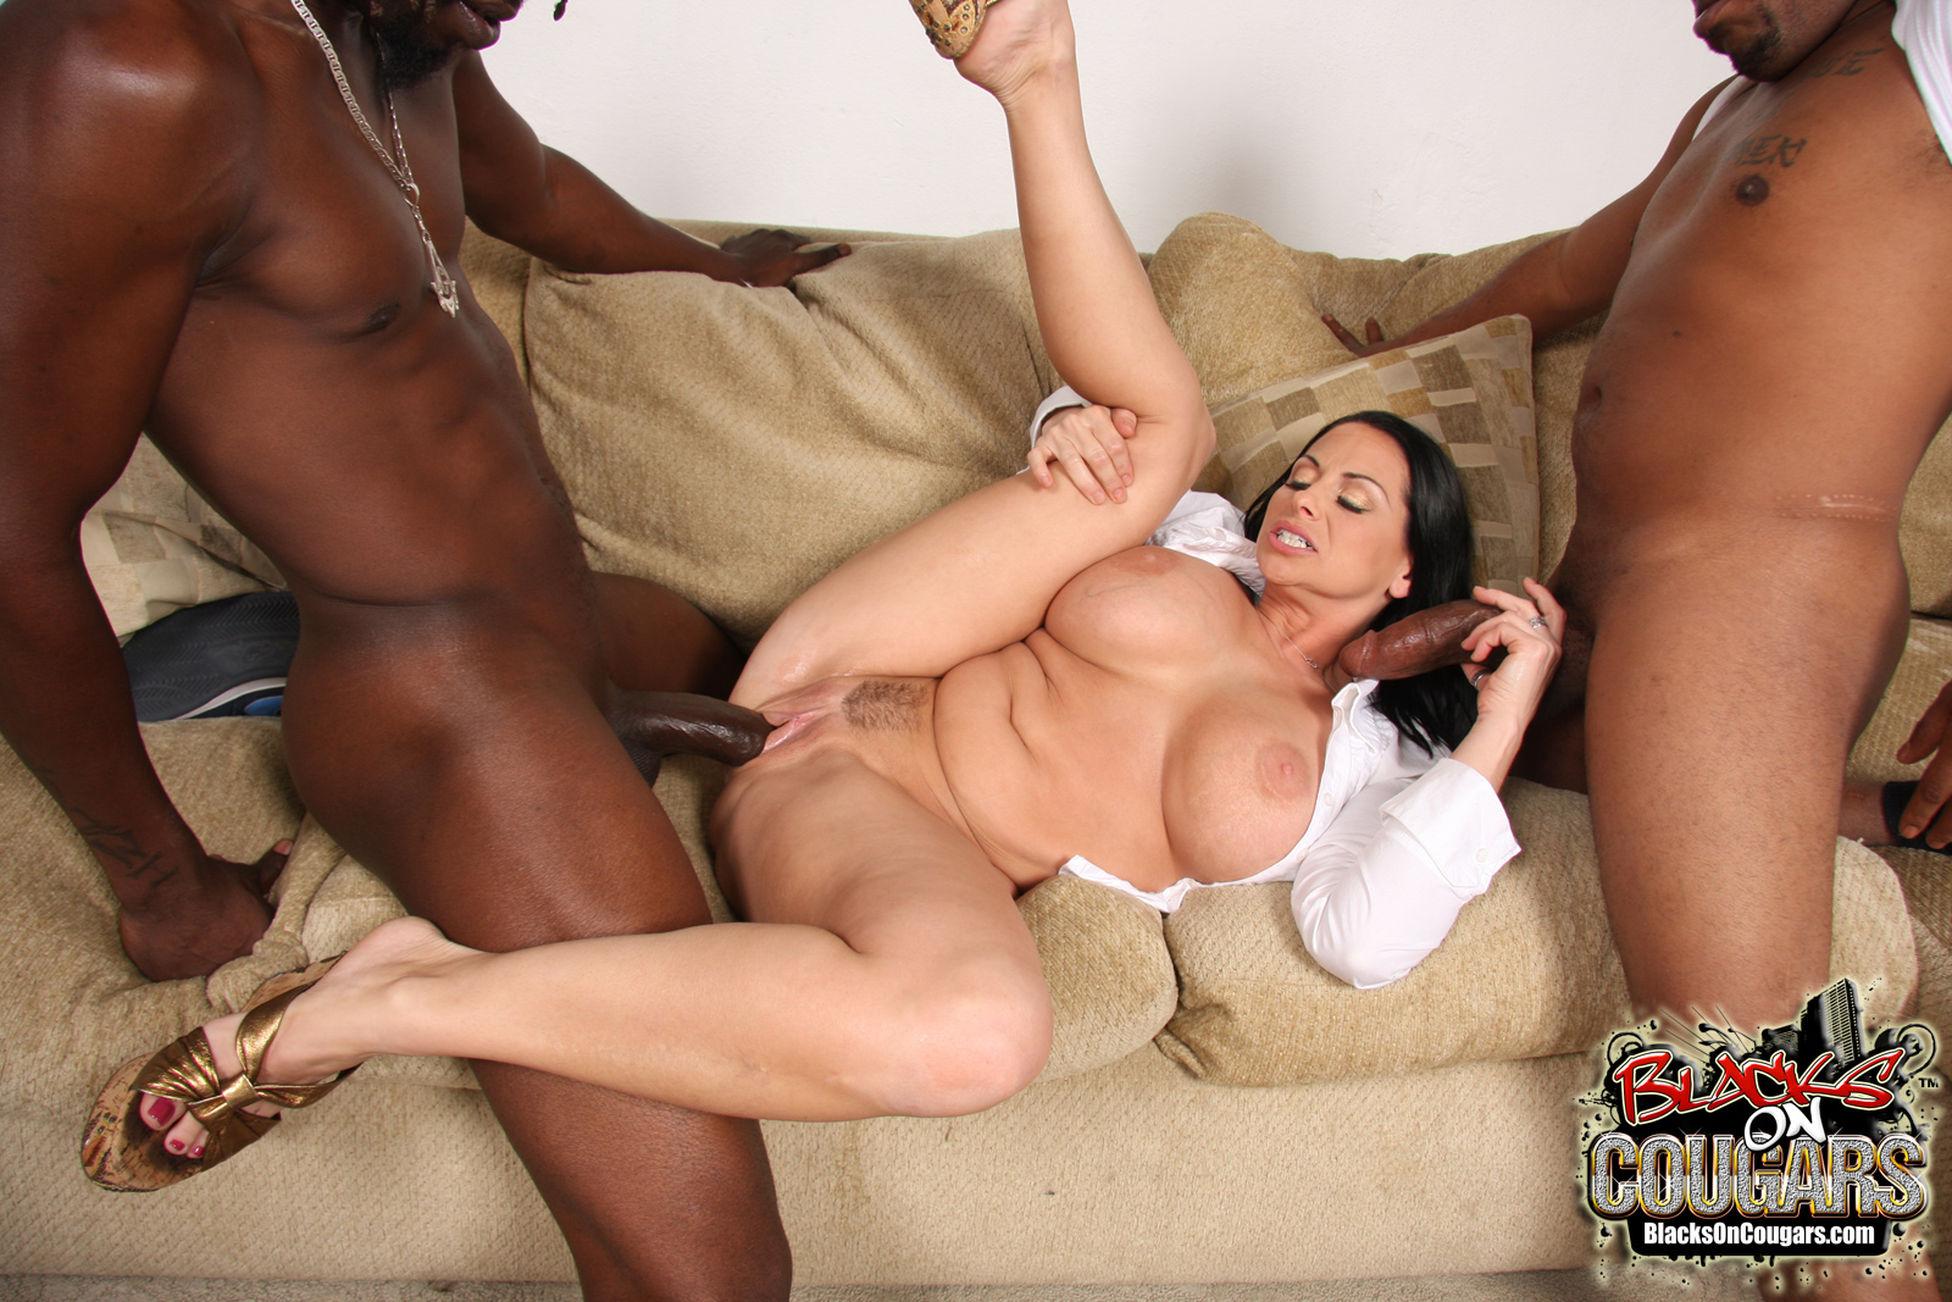 Фото негра и брюнетки секс 3 фотография